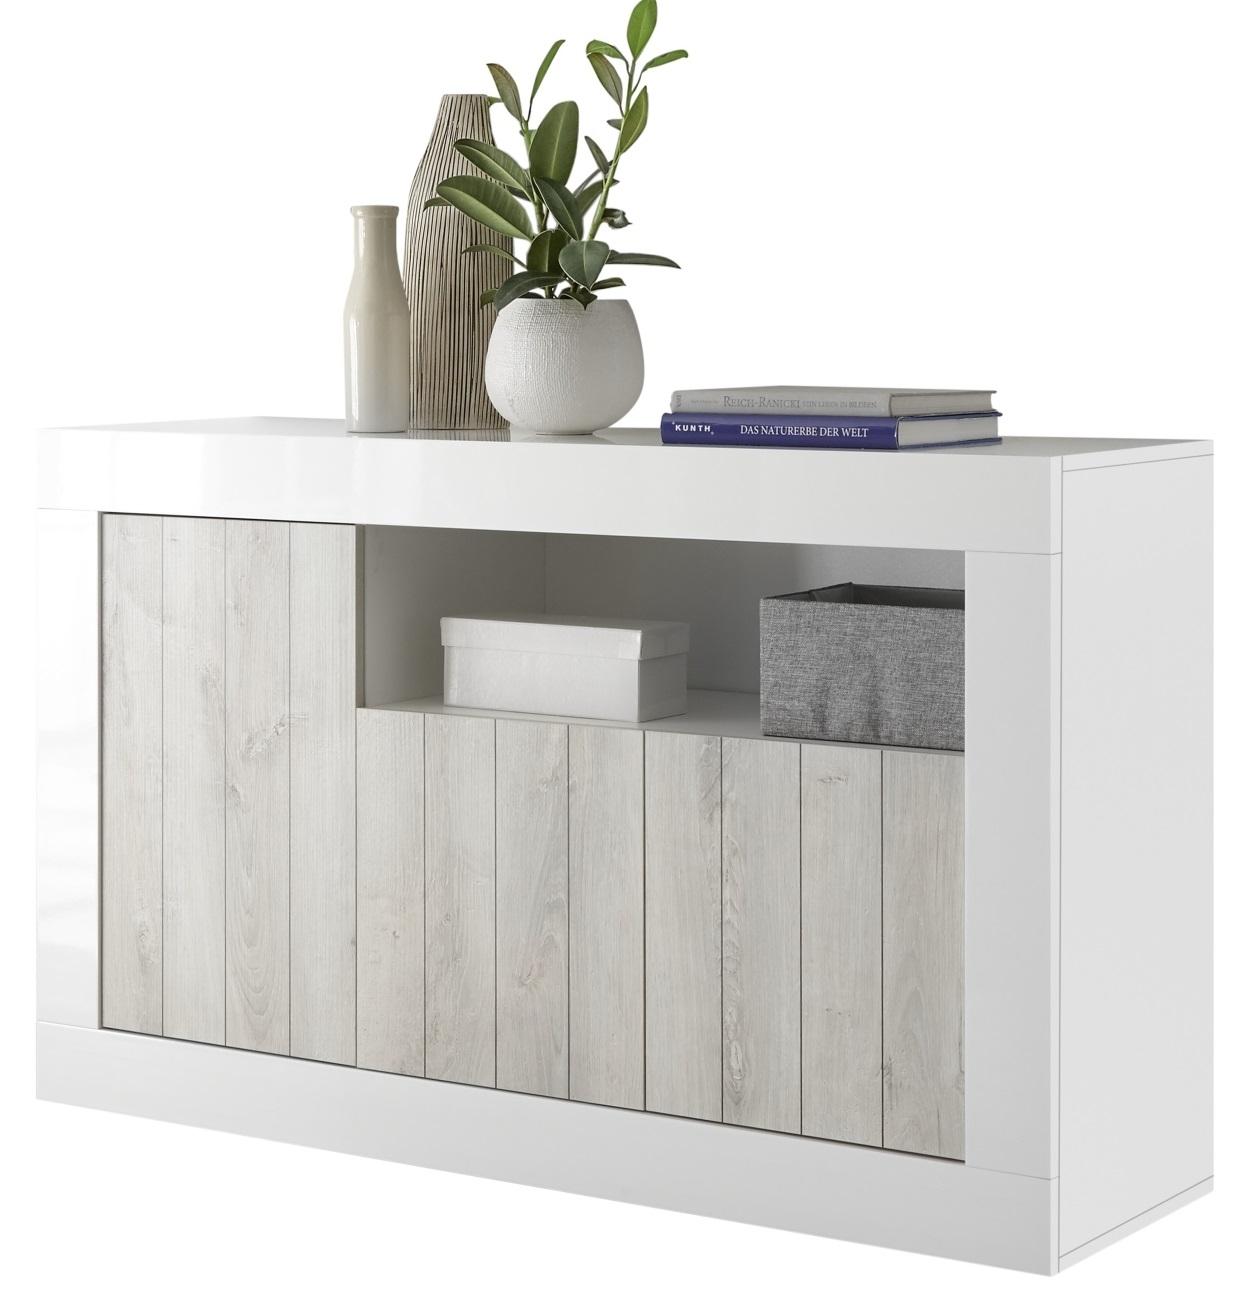 Dressoir Urbino 138 cm breed in hoogglans wit met grenen wit